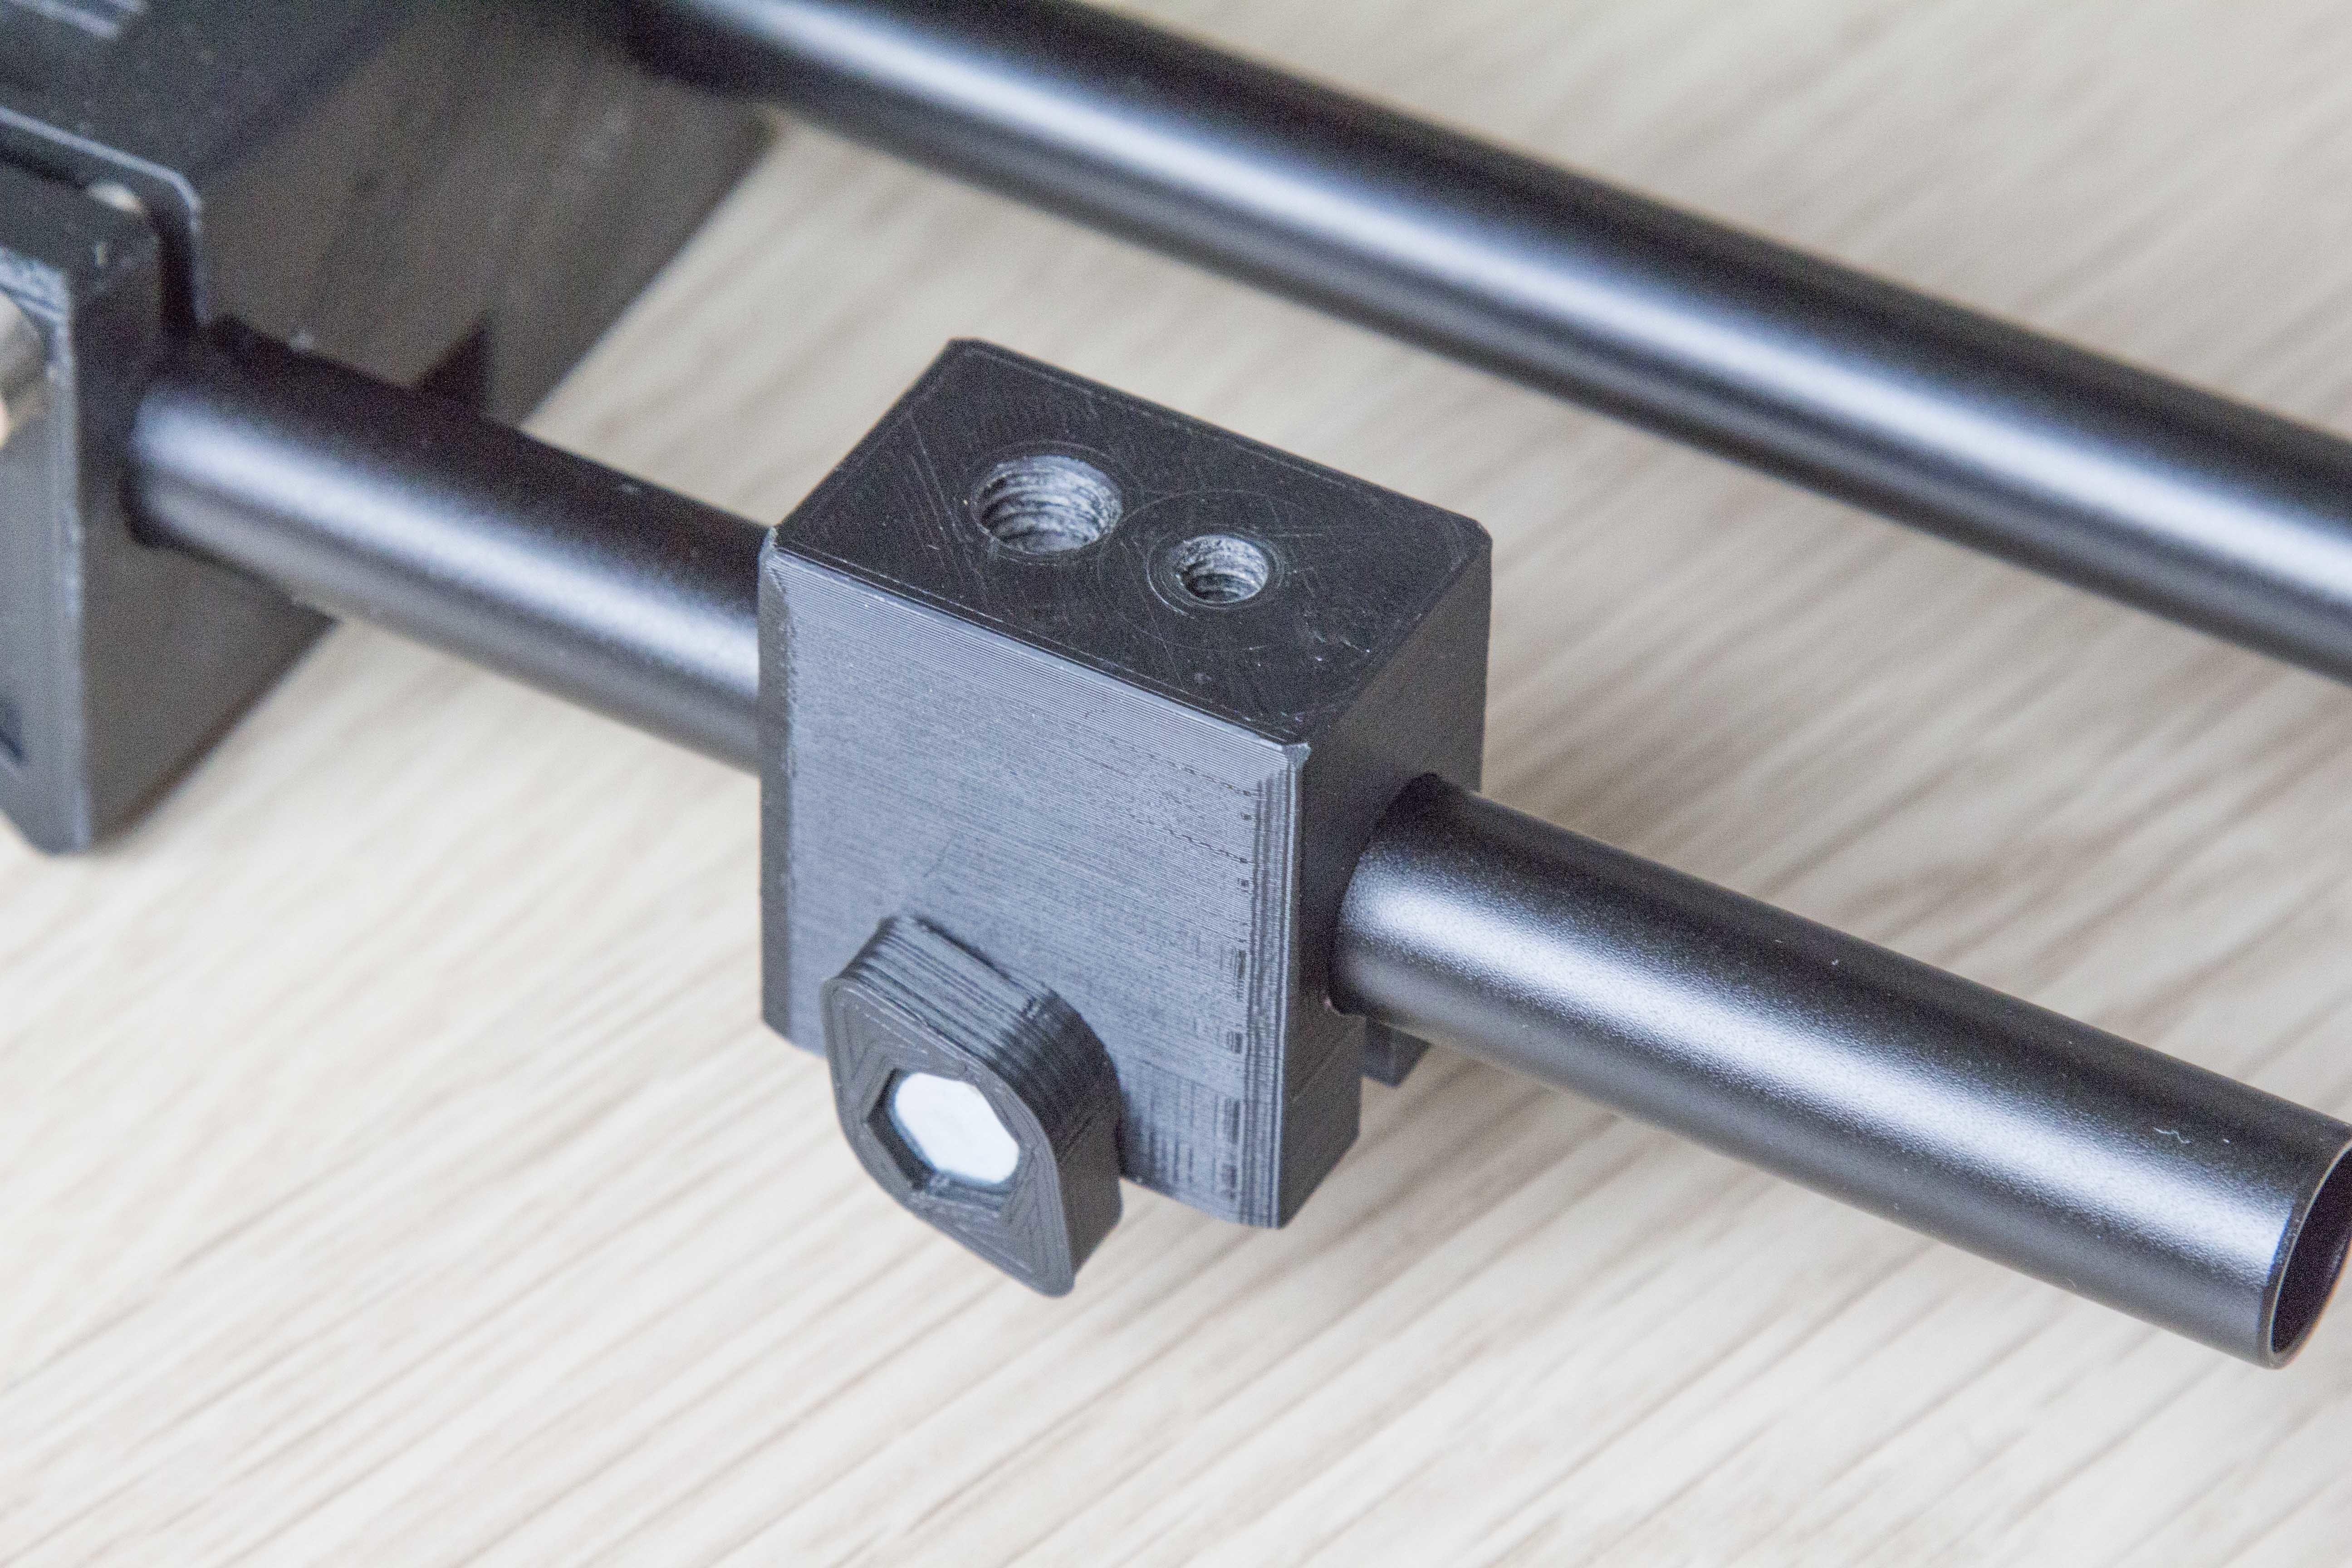 Mini Clamp.jpg Download free STL file Mini clamp • Template to 3D print, Clap3D